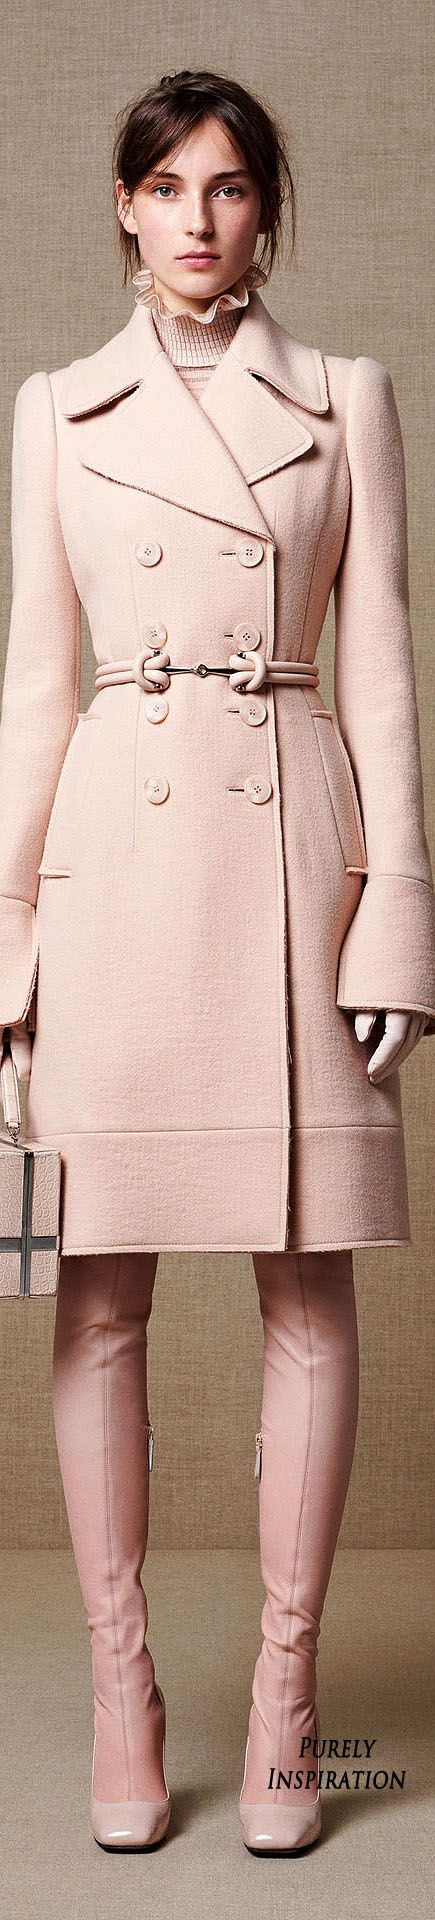 Alexander McQueen FW2015 Women\'s Fashion RTW   Purely Inspiration ...